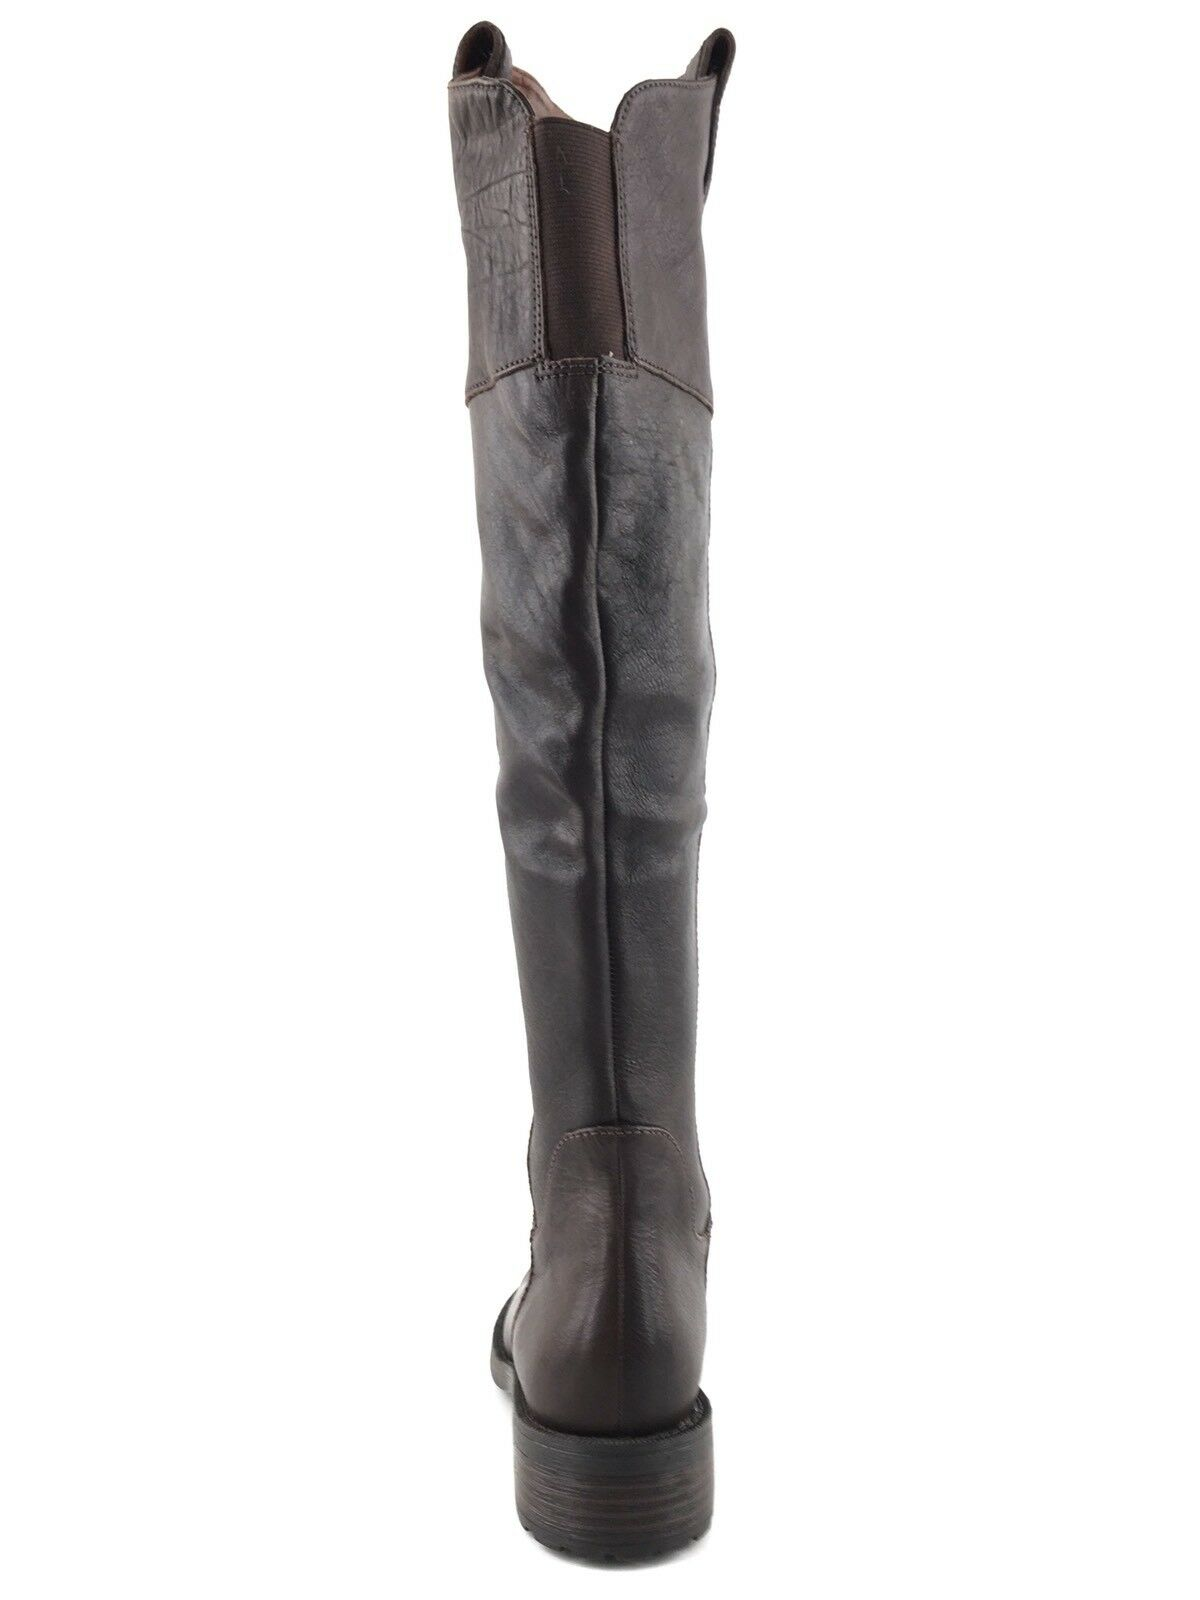 Enzo Angiolini Holdyn Braun Leder Over TheKnee Stiefel Damens's Größe 5.5 M